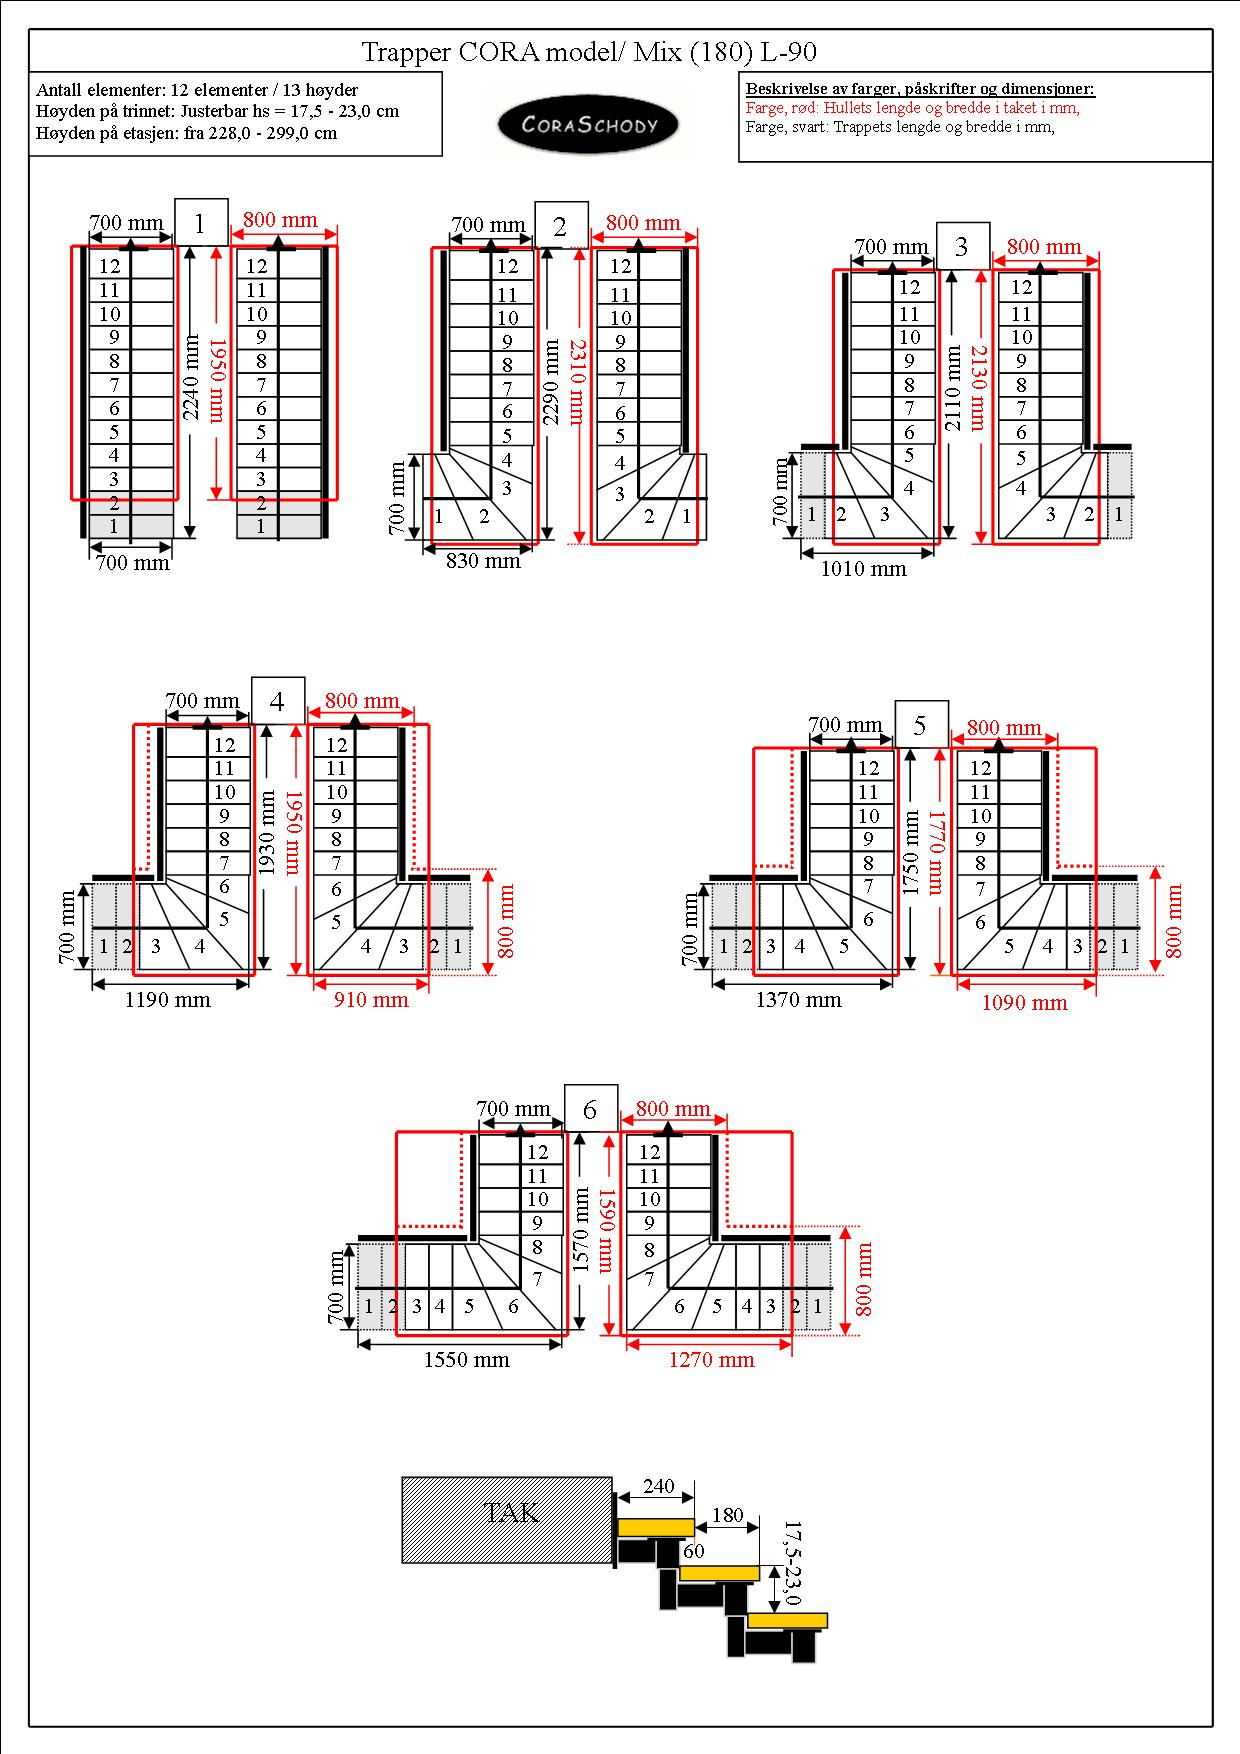 Metalltrappor Metalltrappor Model Mix 02 L 90 12 Element